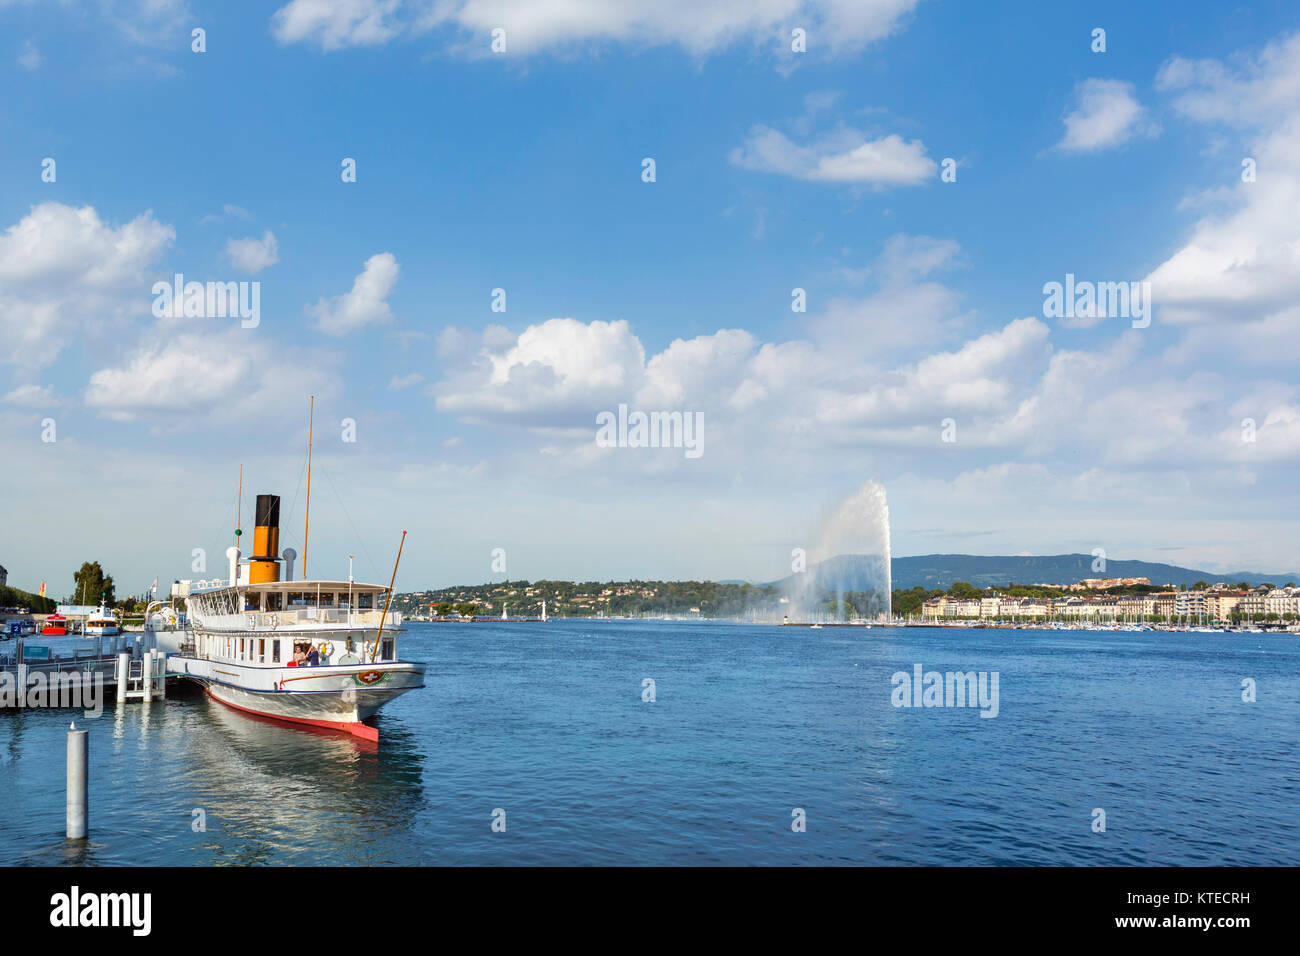 Lakefront looking towards the Jet d'Eau, Geneva (Geneve), Lake Geneva, Switzerland - Stock Image